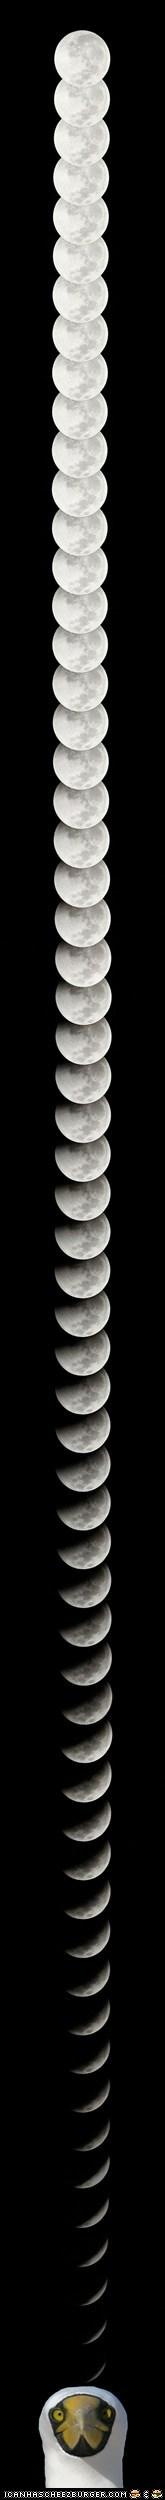 birds,long,moon,moons,surprise,wtf